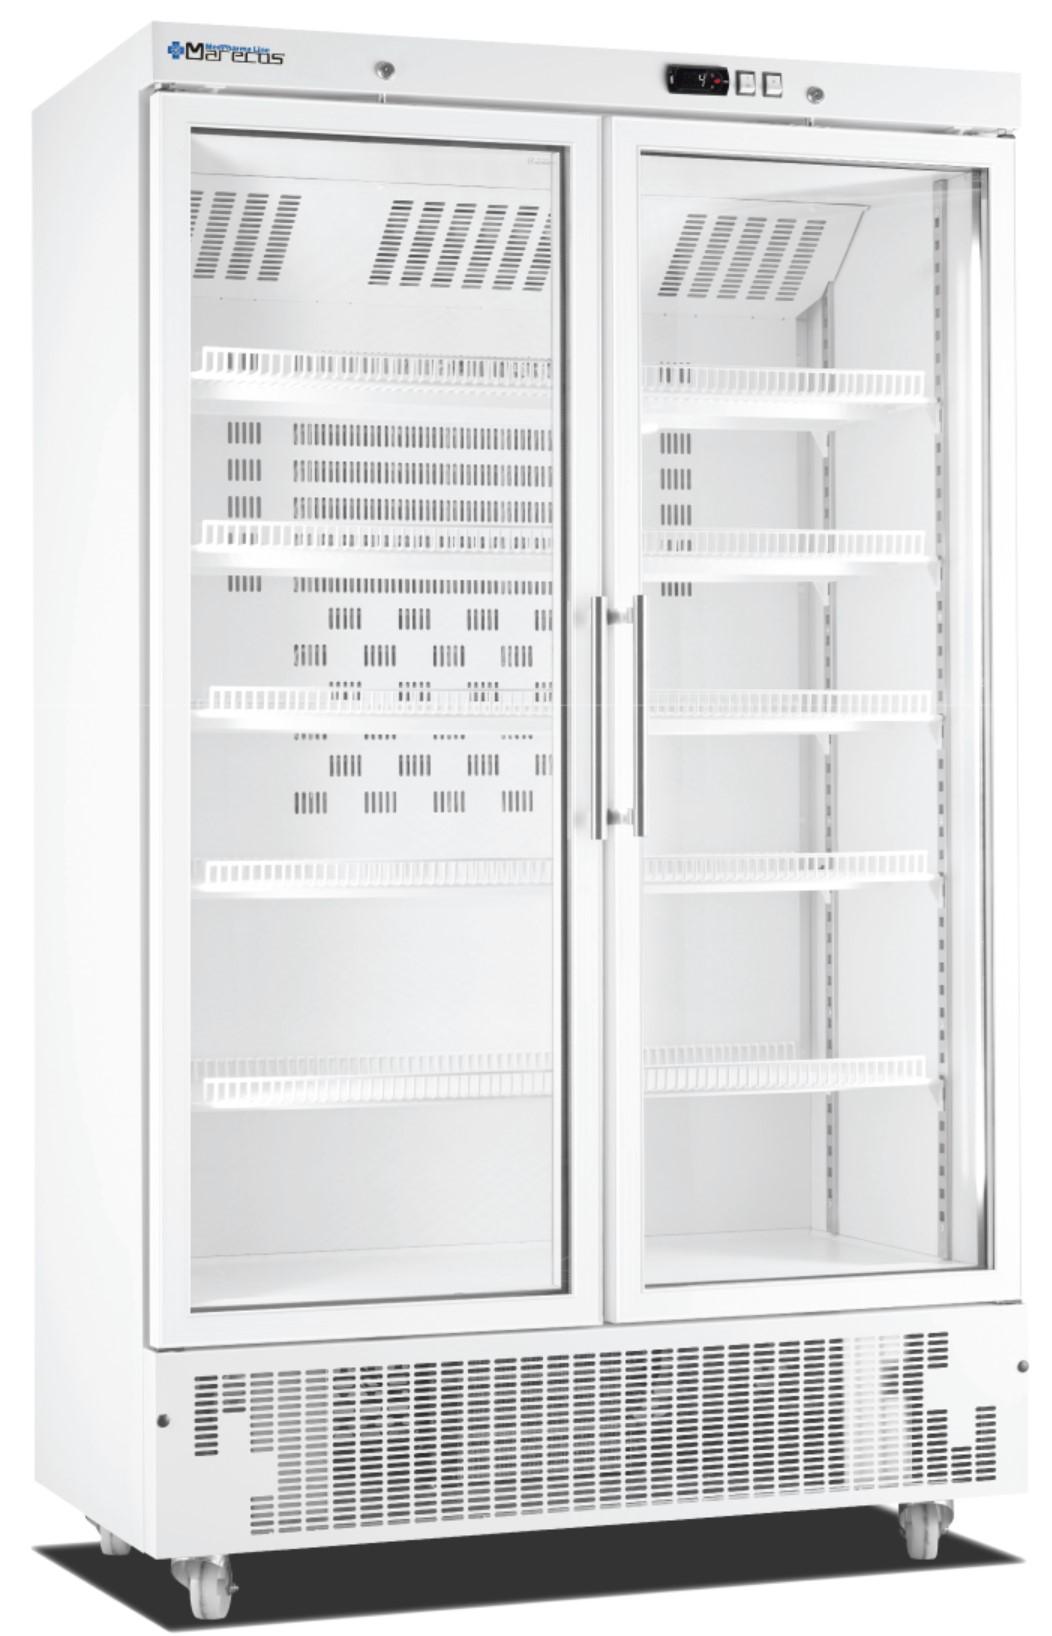 vitrina-sunthrhshs-farmakeiou-diplh-ARV800-CS-PV-genikoemporio-zagorianos